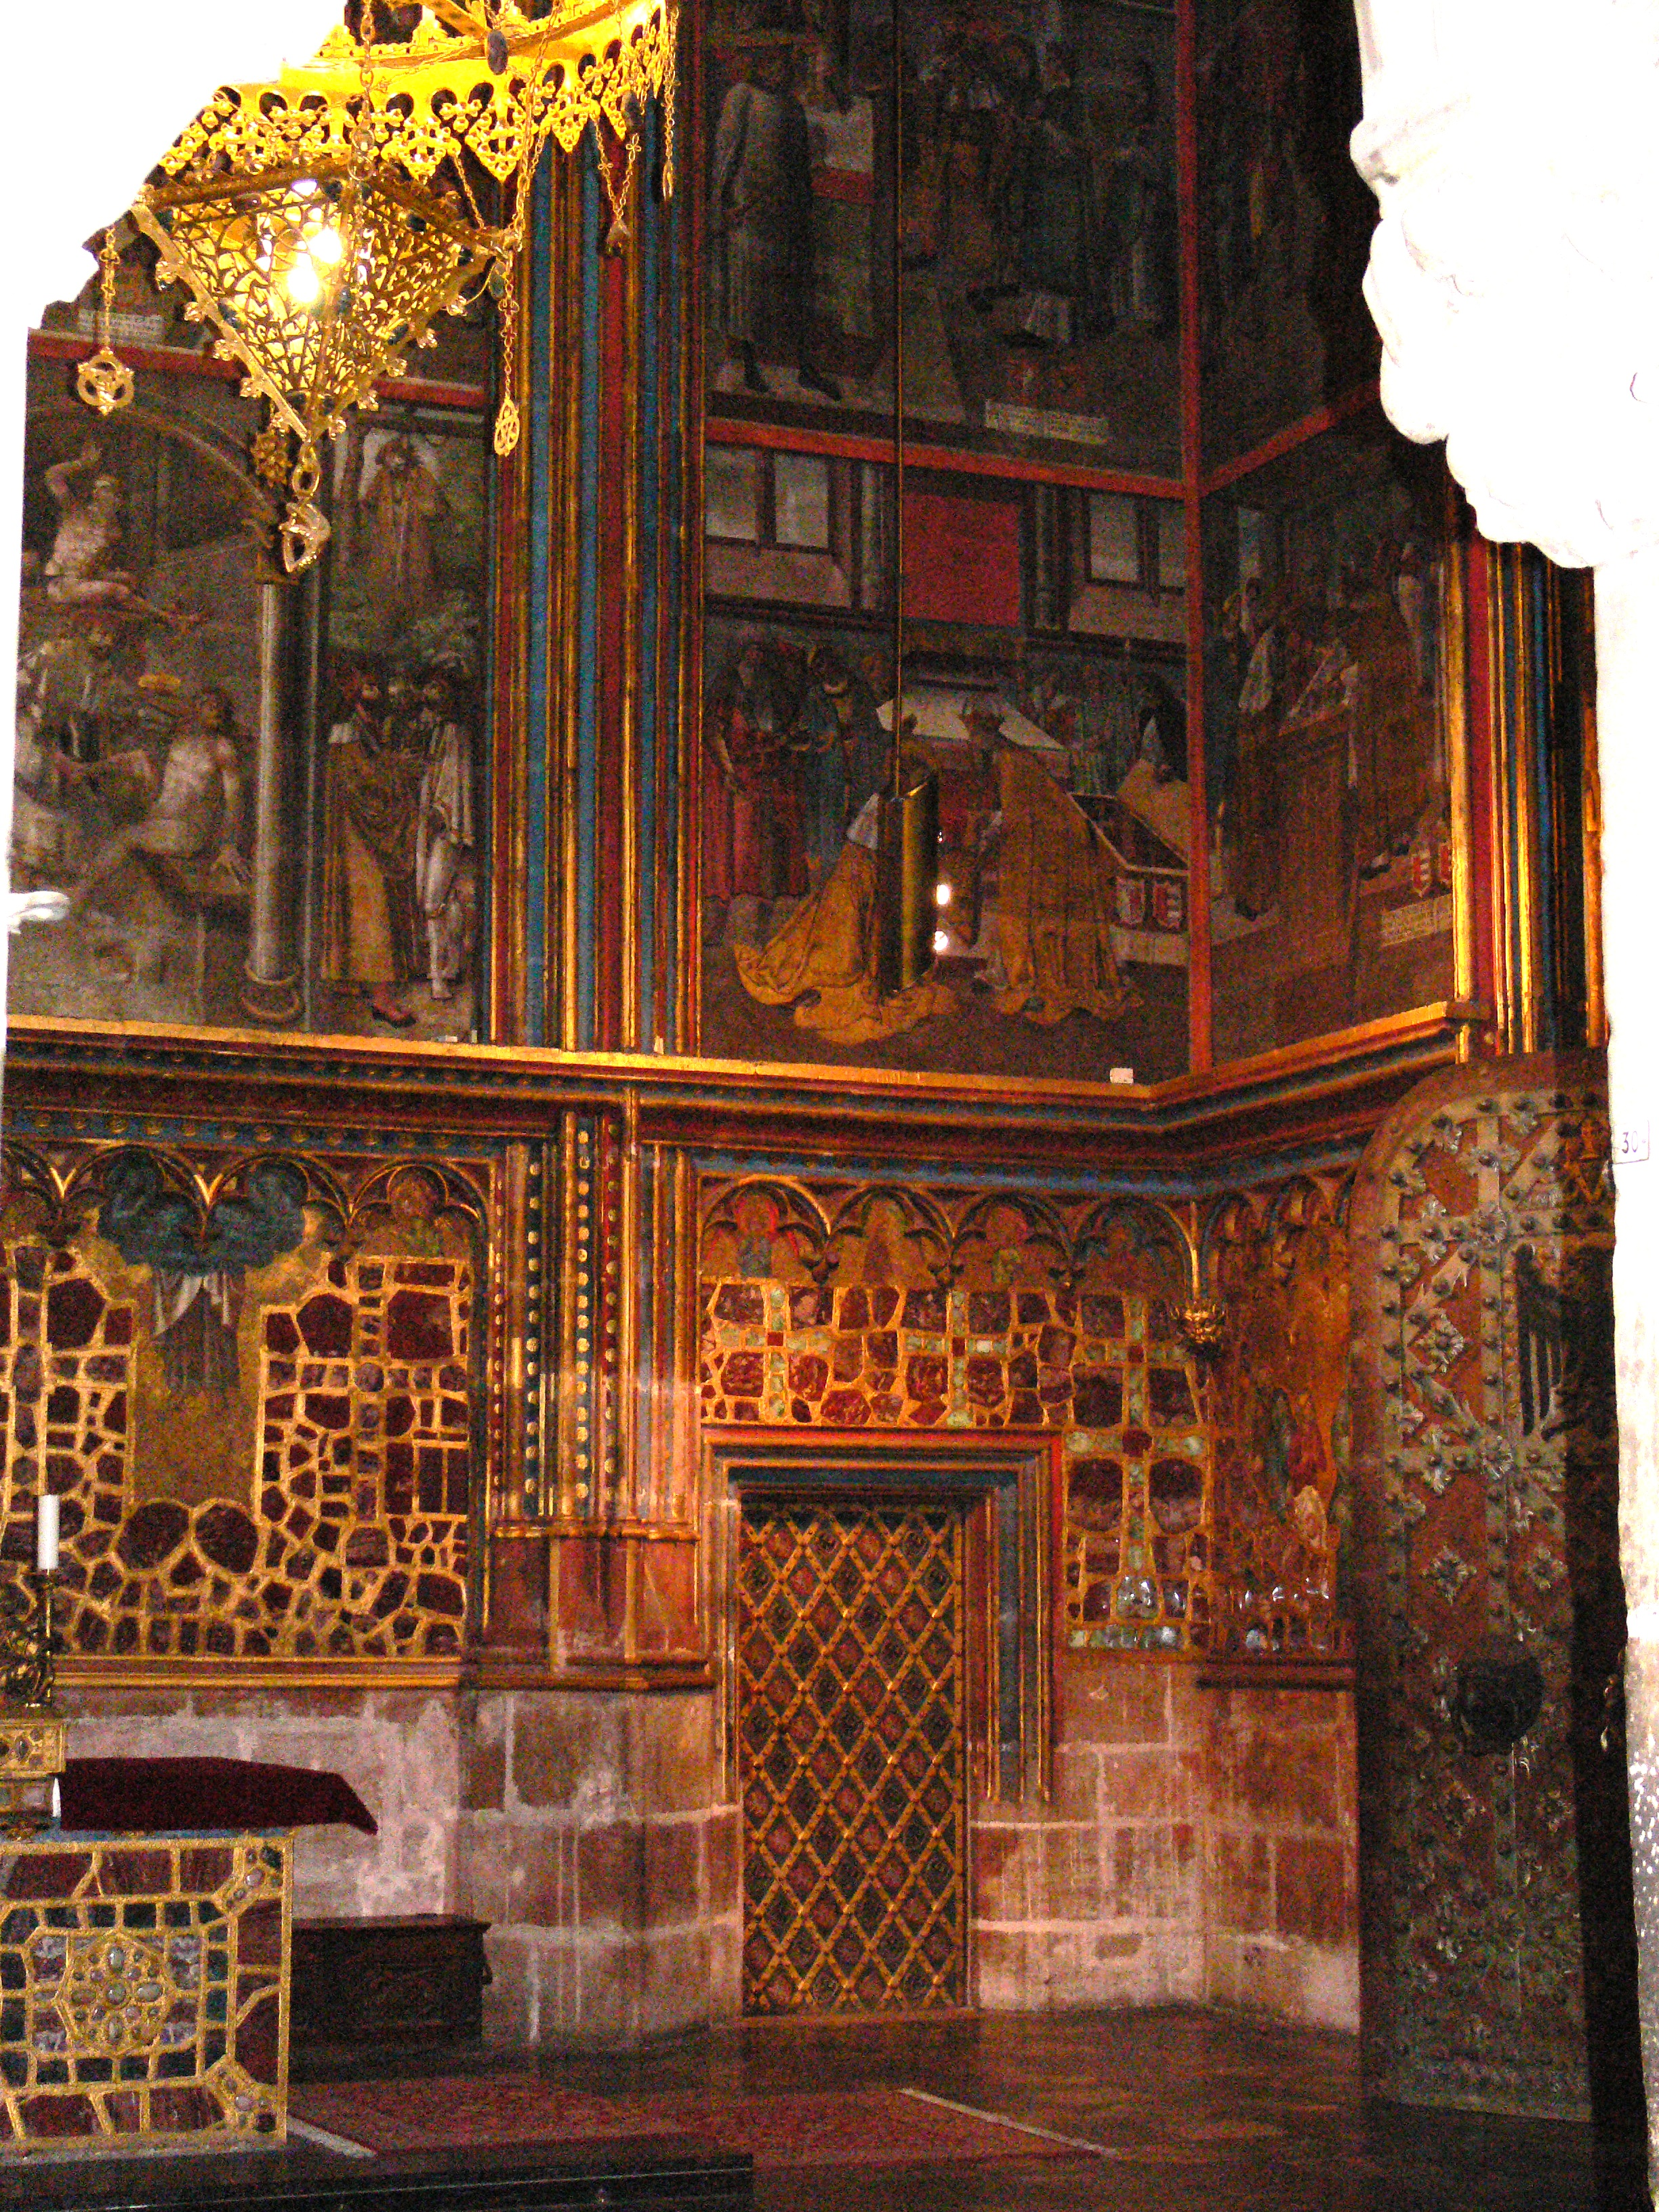 http://upload.wikimedia.org/wikipedia/commons/4/4d/Korunni_komora_dvere.JPG